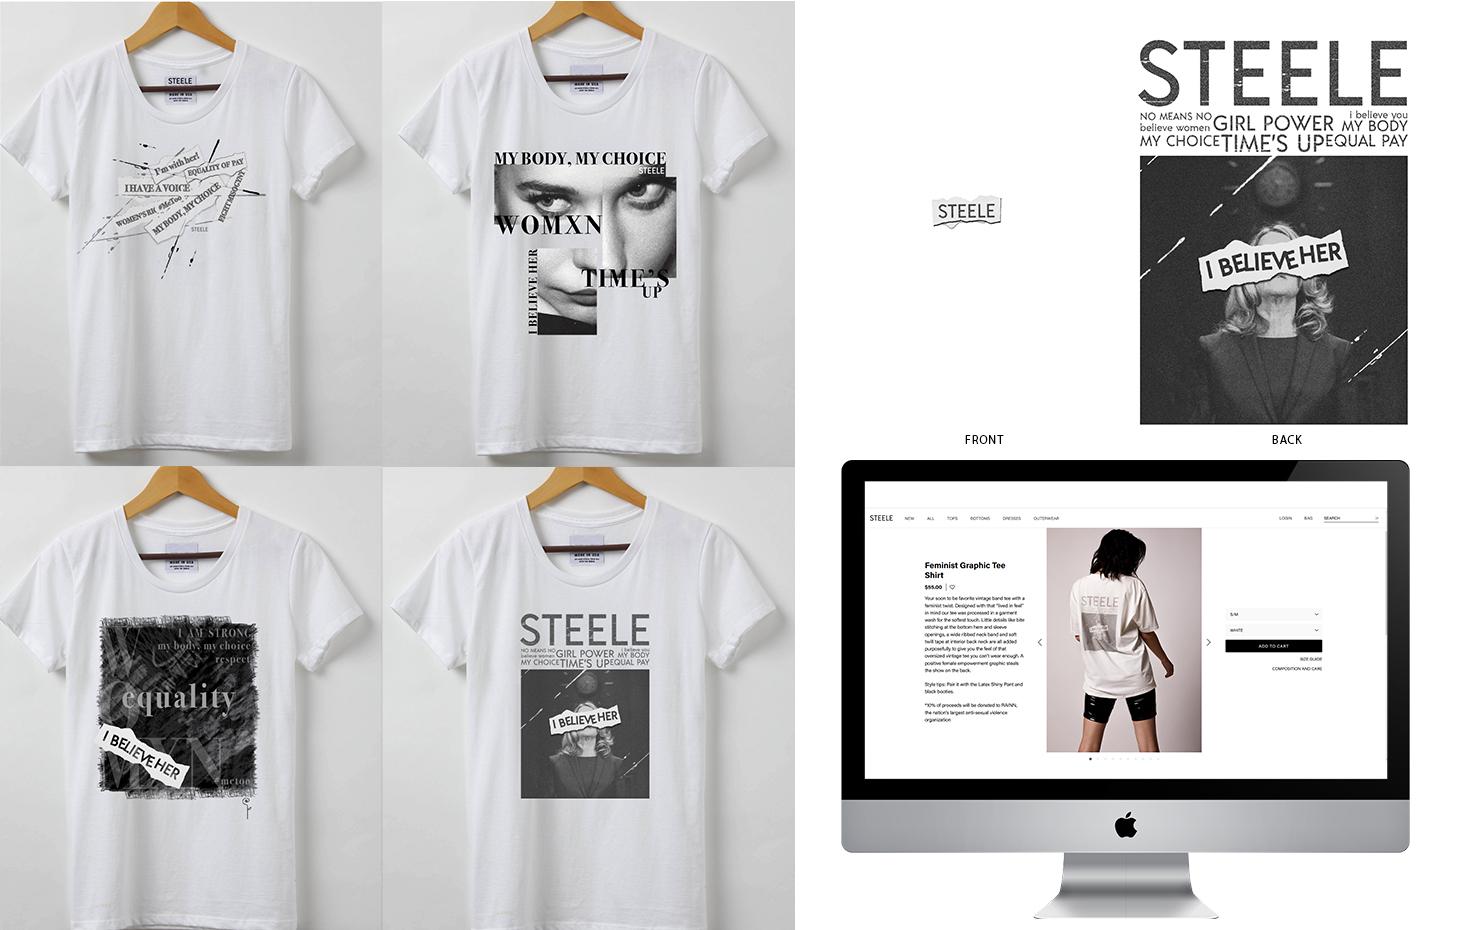 Steele_DAVEQ design.jpg